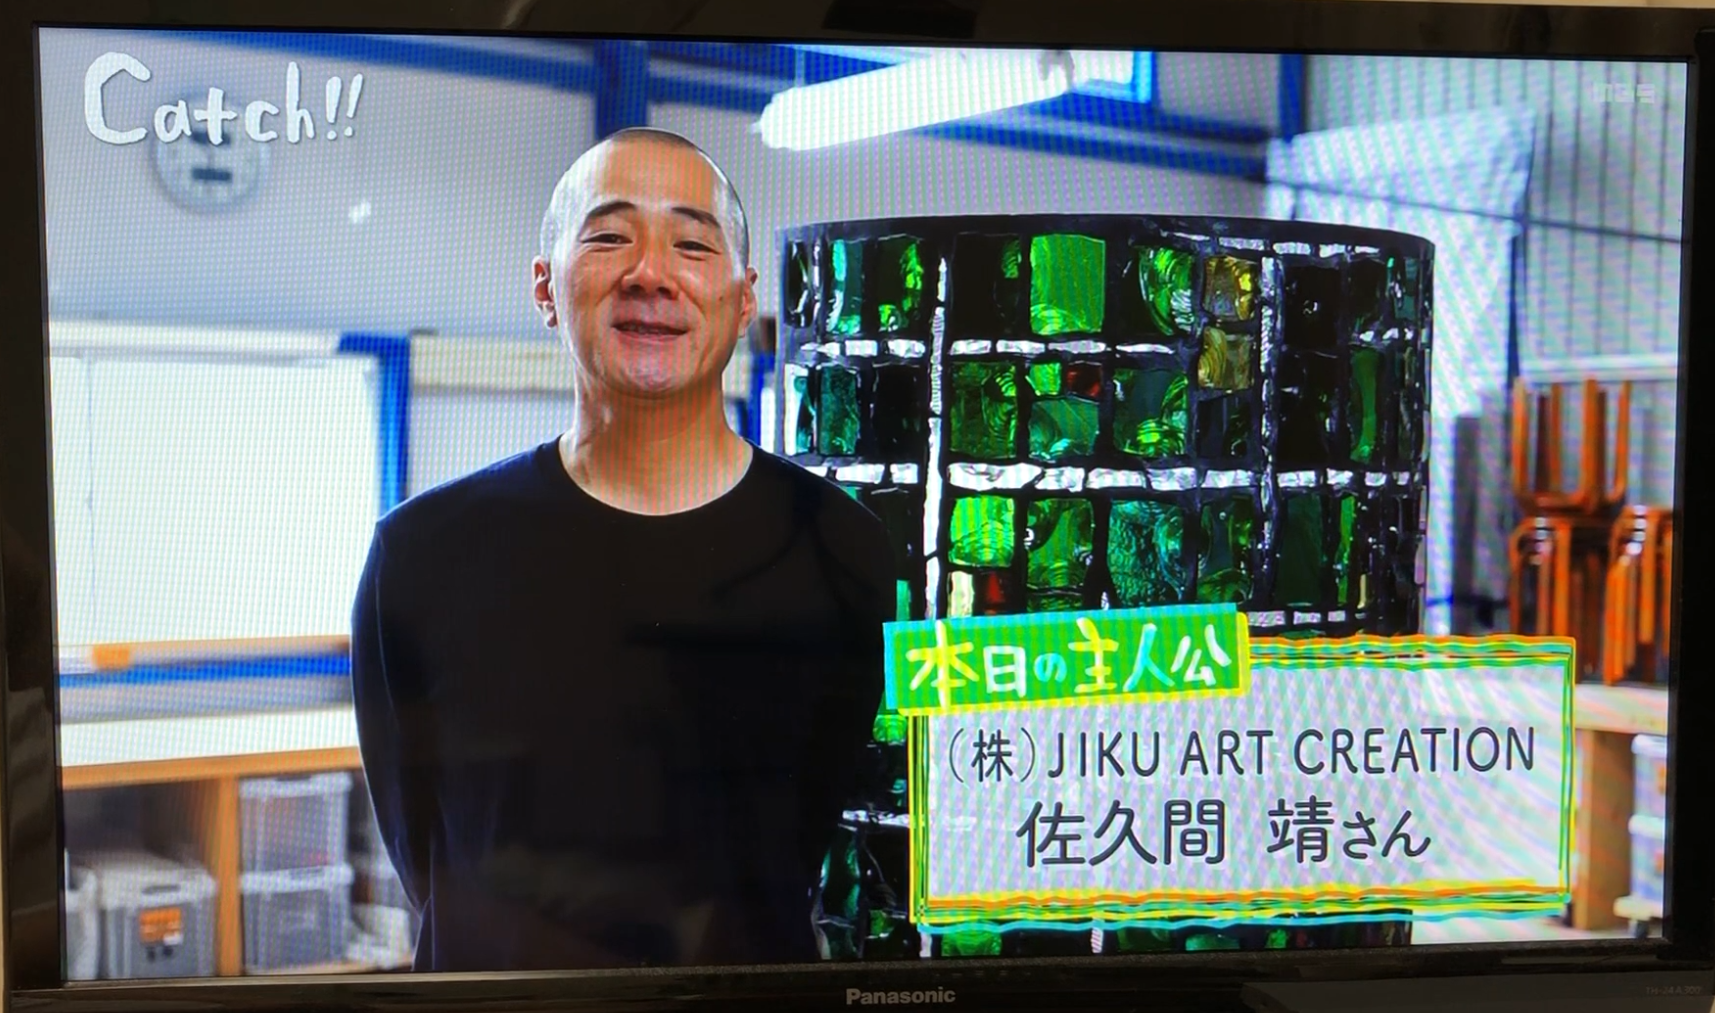 JikuArtCreation(ジクウアートクリエーション)造形ガラス職人佐久間 靖